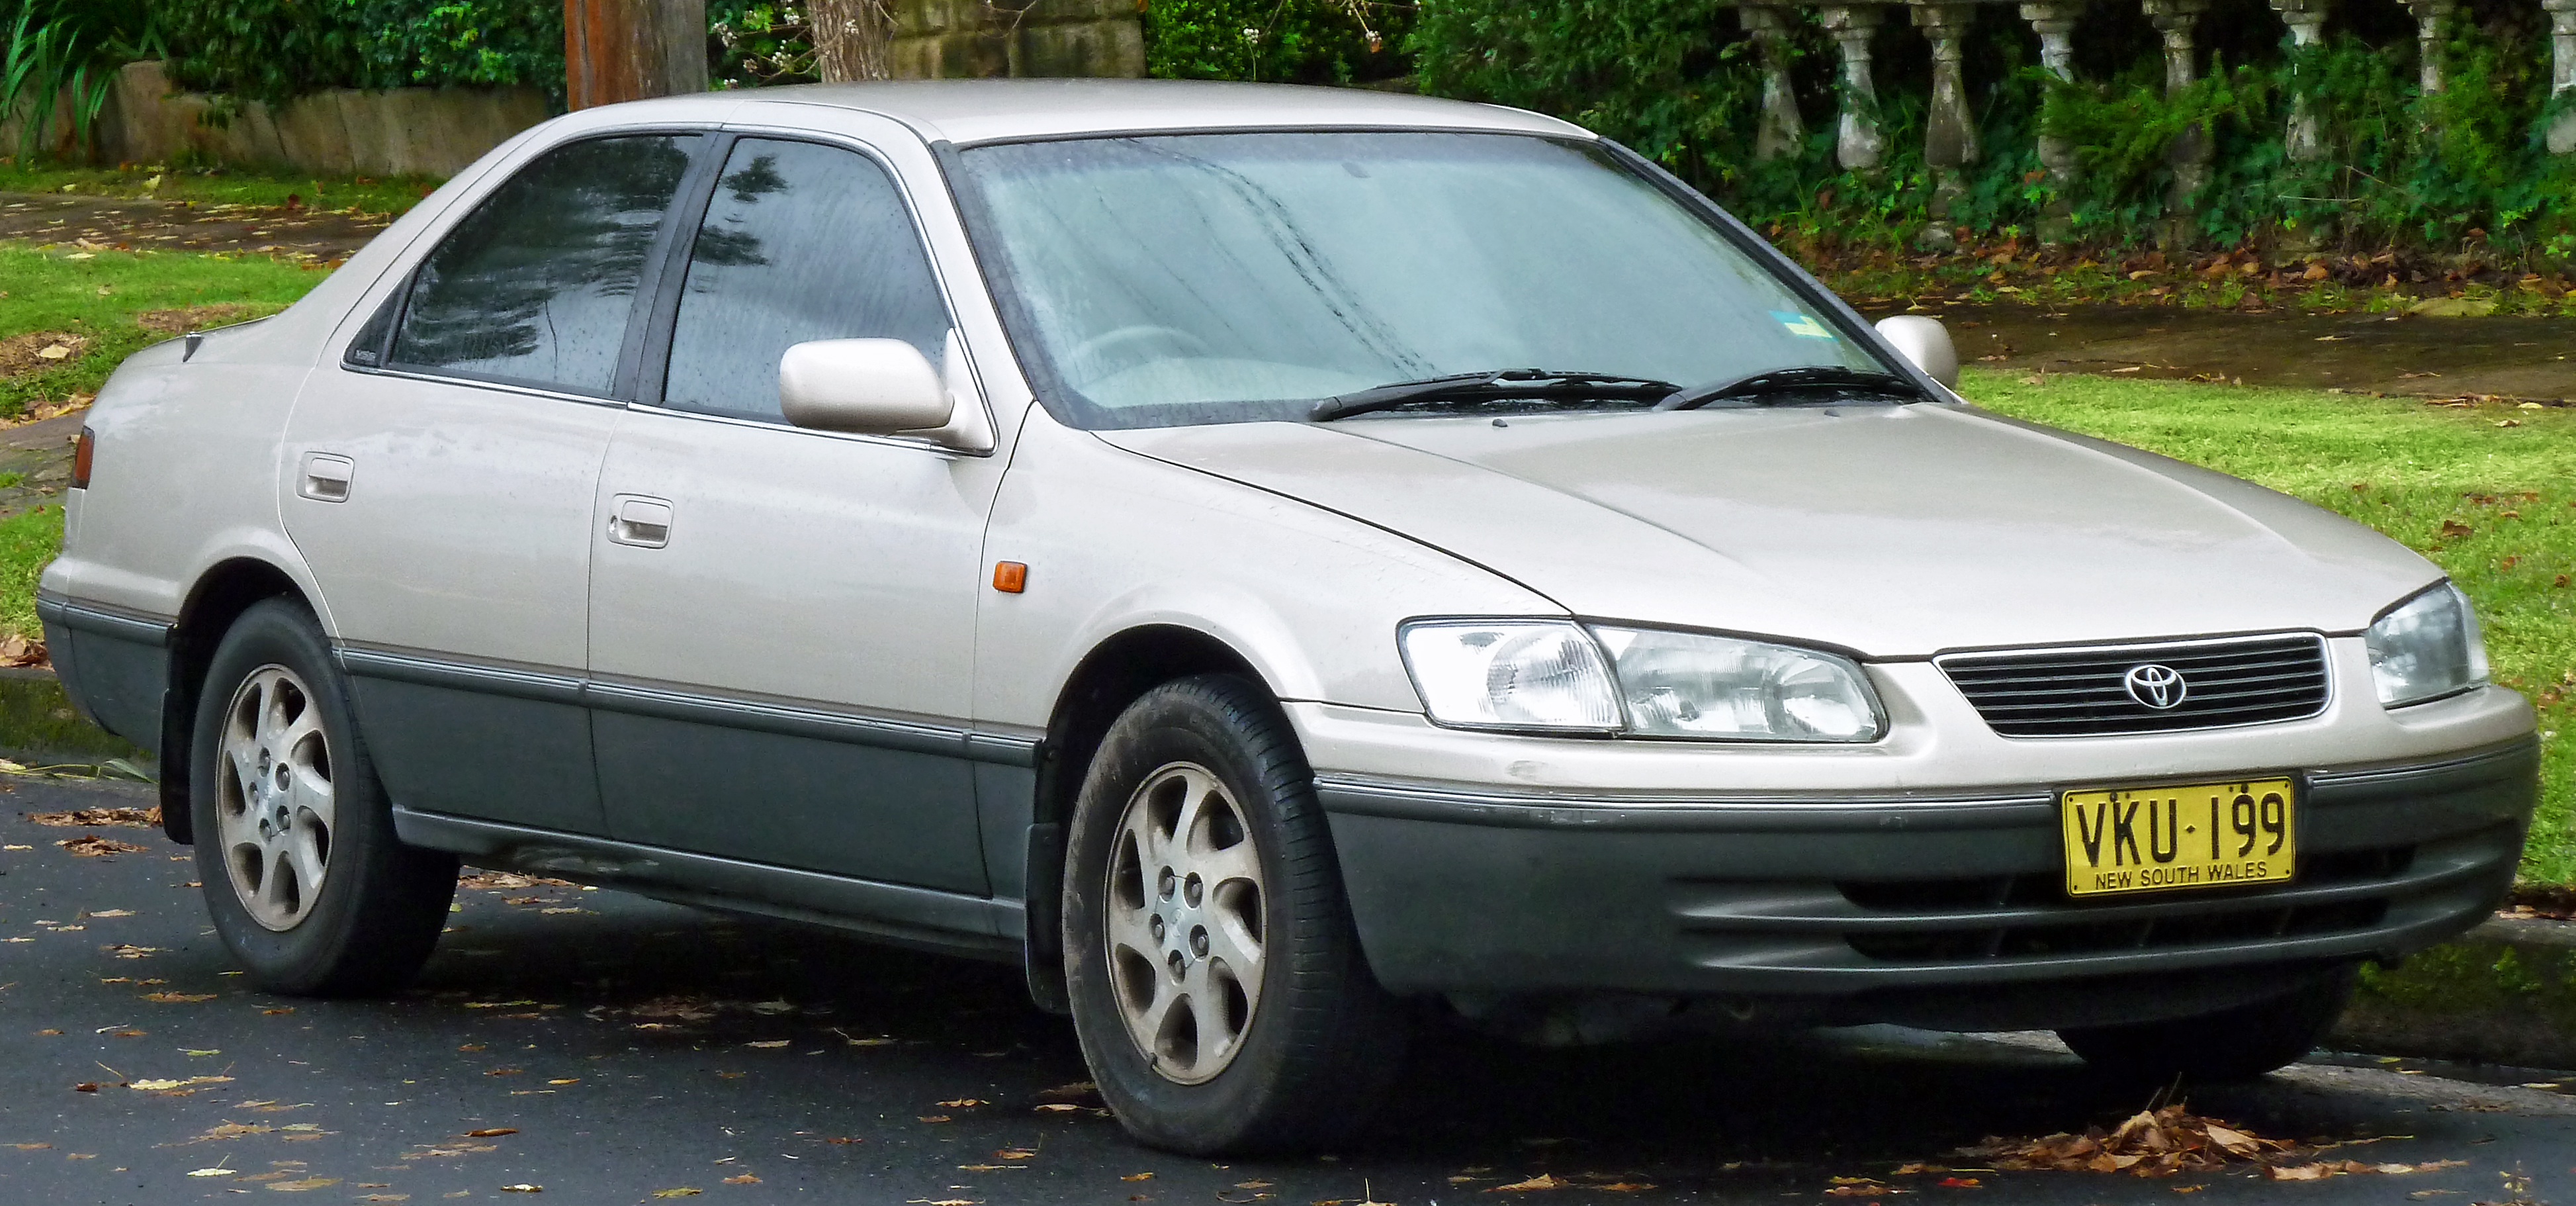 Fil1998 Toyota Vienta Mcv20r Grande Sedan 2011 06 15 01 Blender